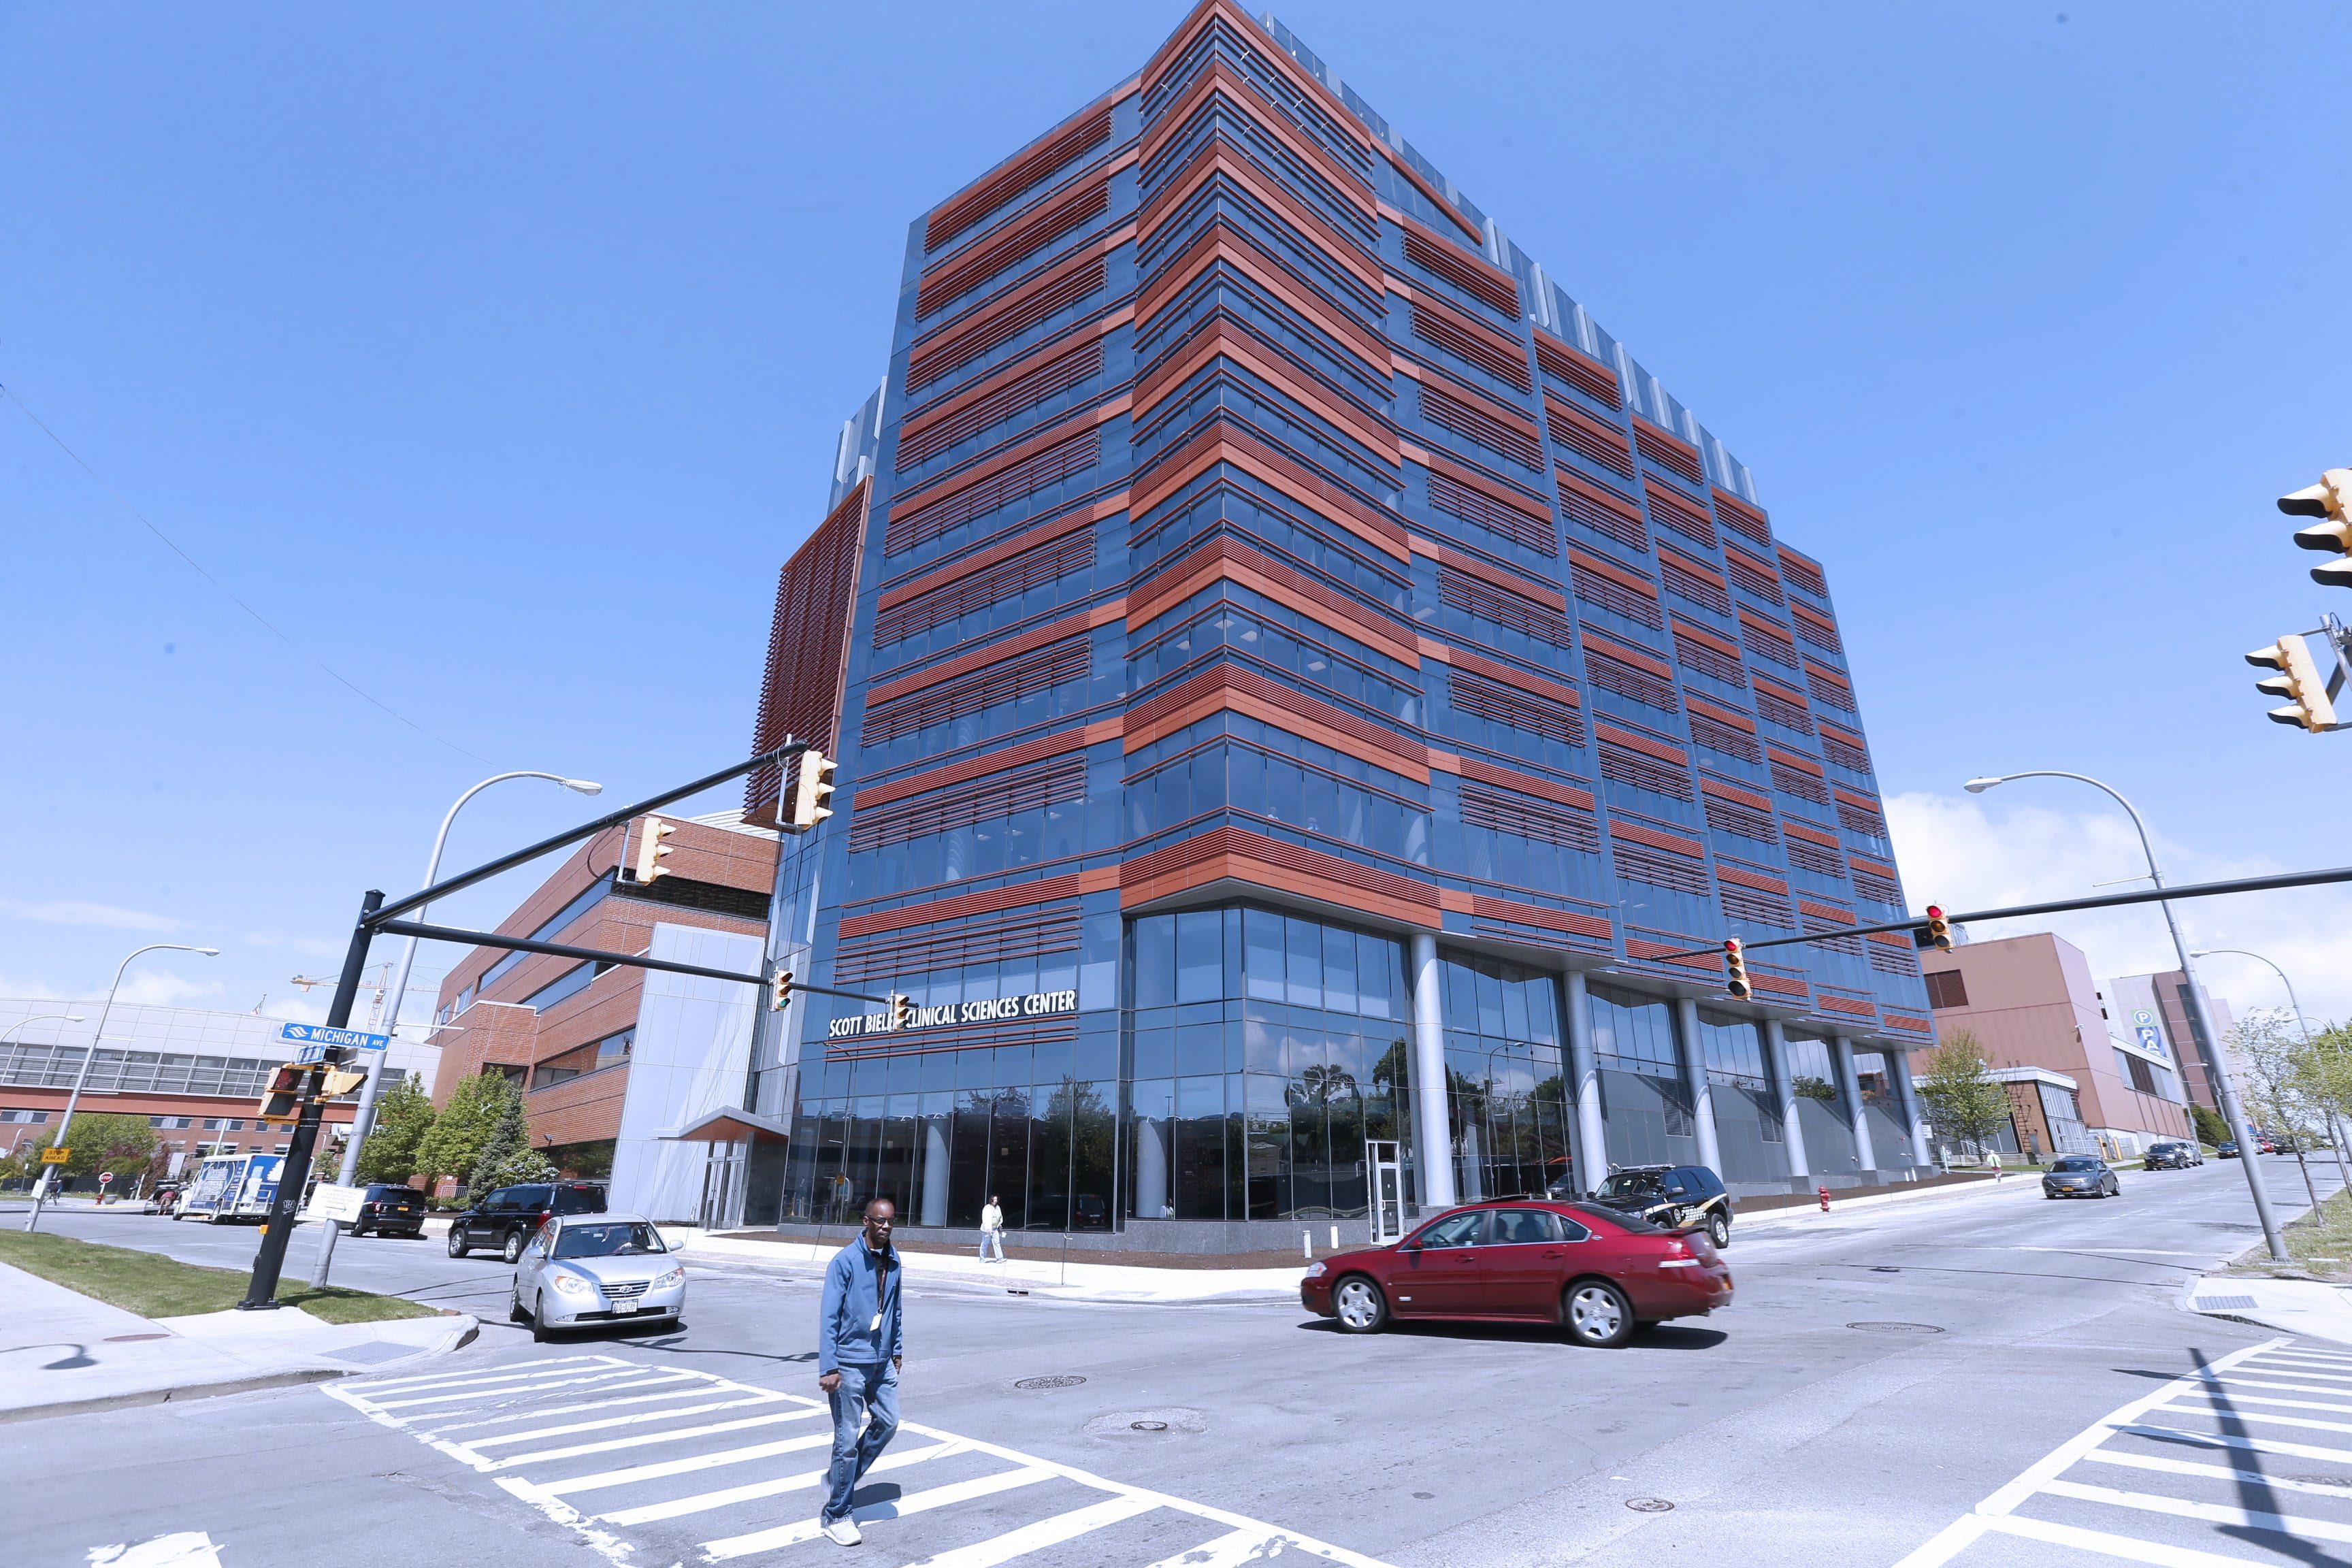 Scott Bieler Clinical Sciences Center on the Roswell Park Cancer Institute campus.  (Robert Kirkham/Buffalo News)